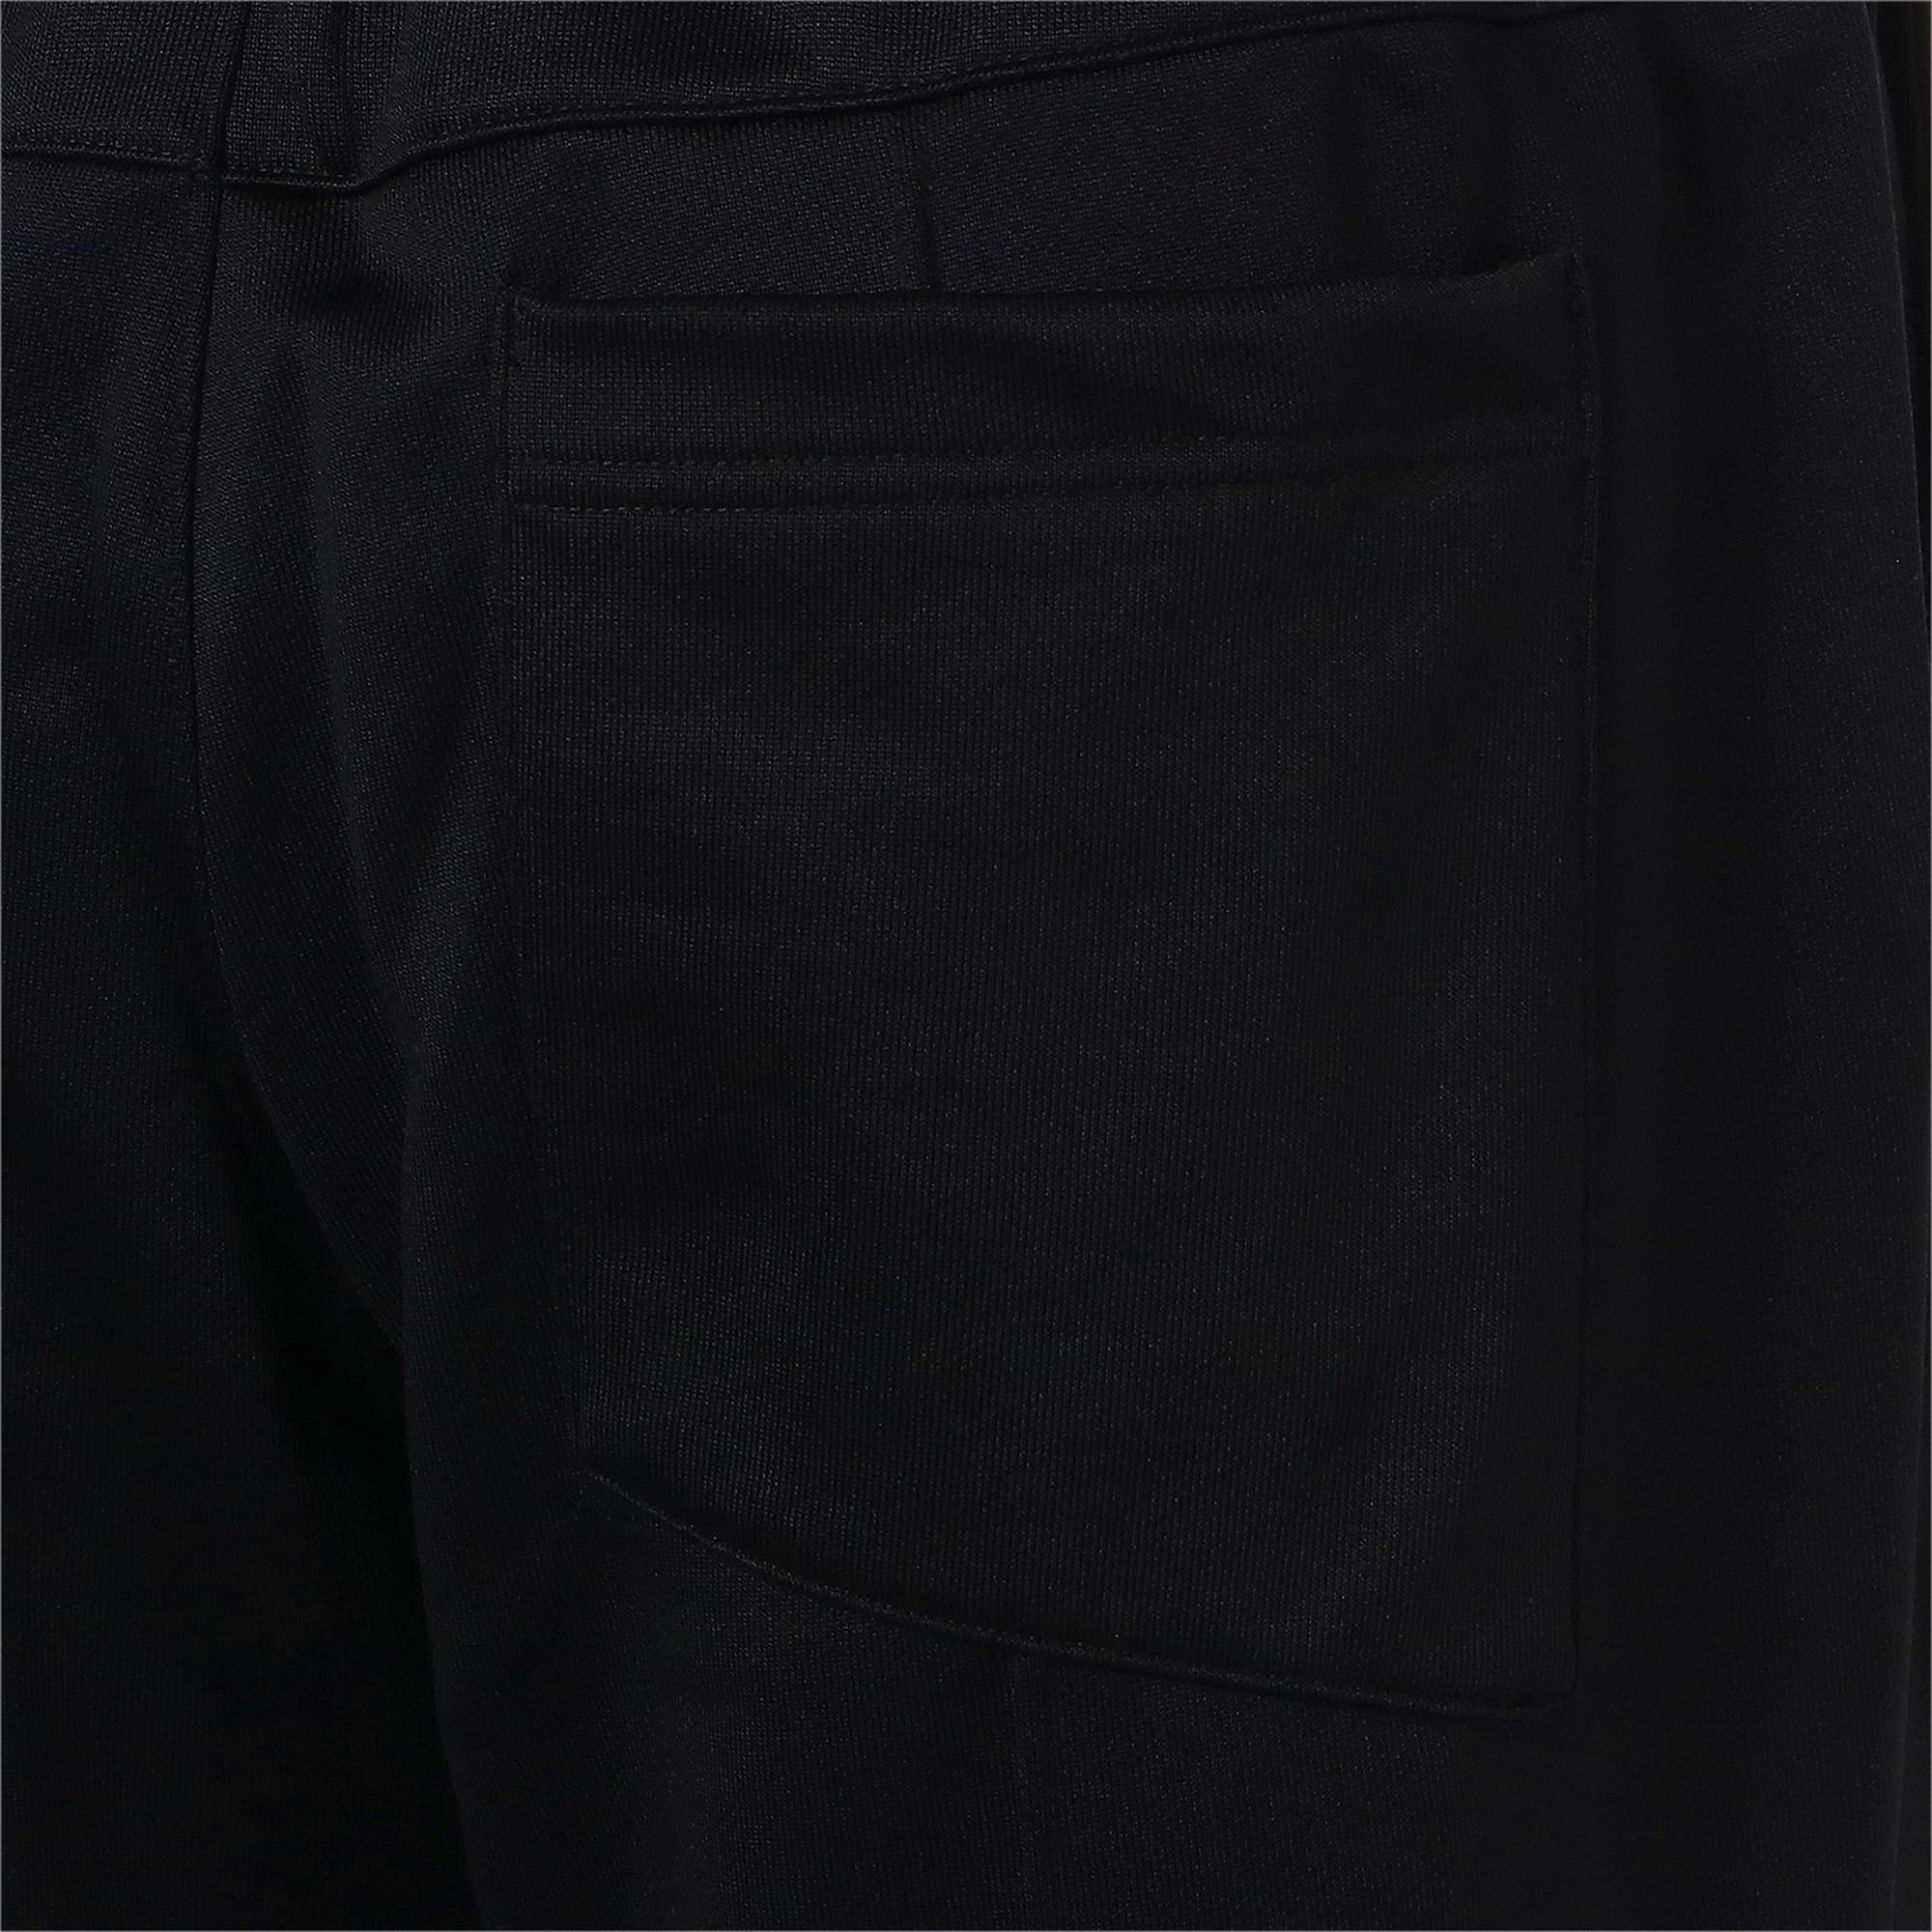 Thumbnail 8 of PUMA x RHUDE トラックパンツ, Puma Black, medium-JPN